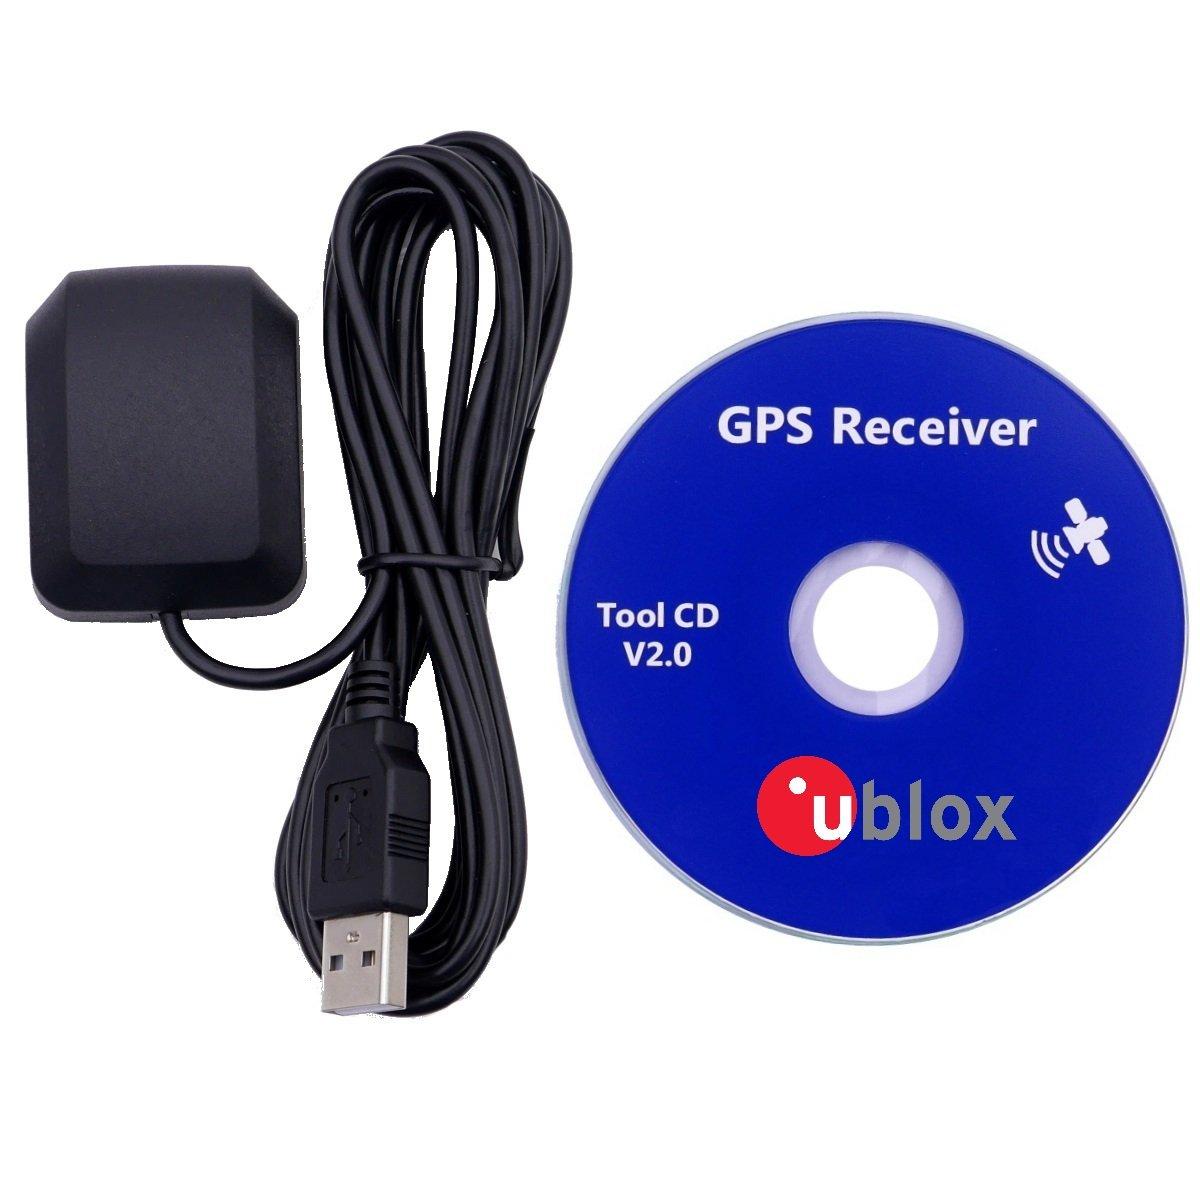 USB 2.0 impermeabile Active GPS GLONASS UBLOX ricevitore antenna, guadagno: dB QGP Supply Q1042